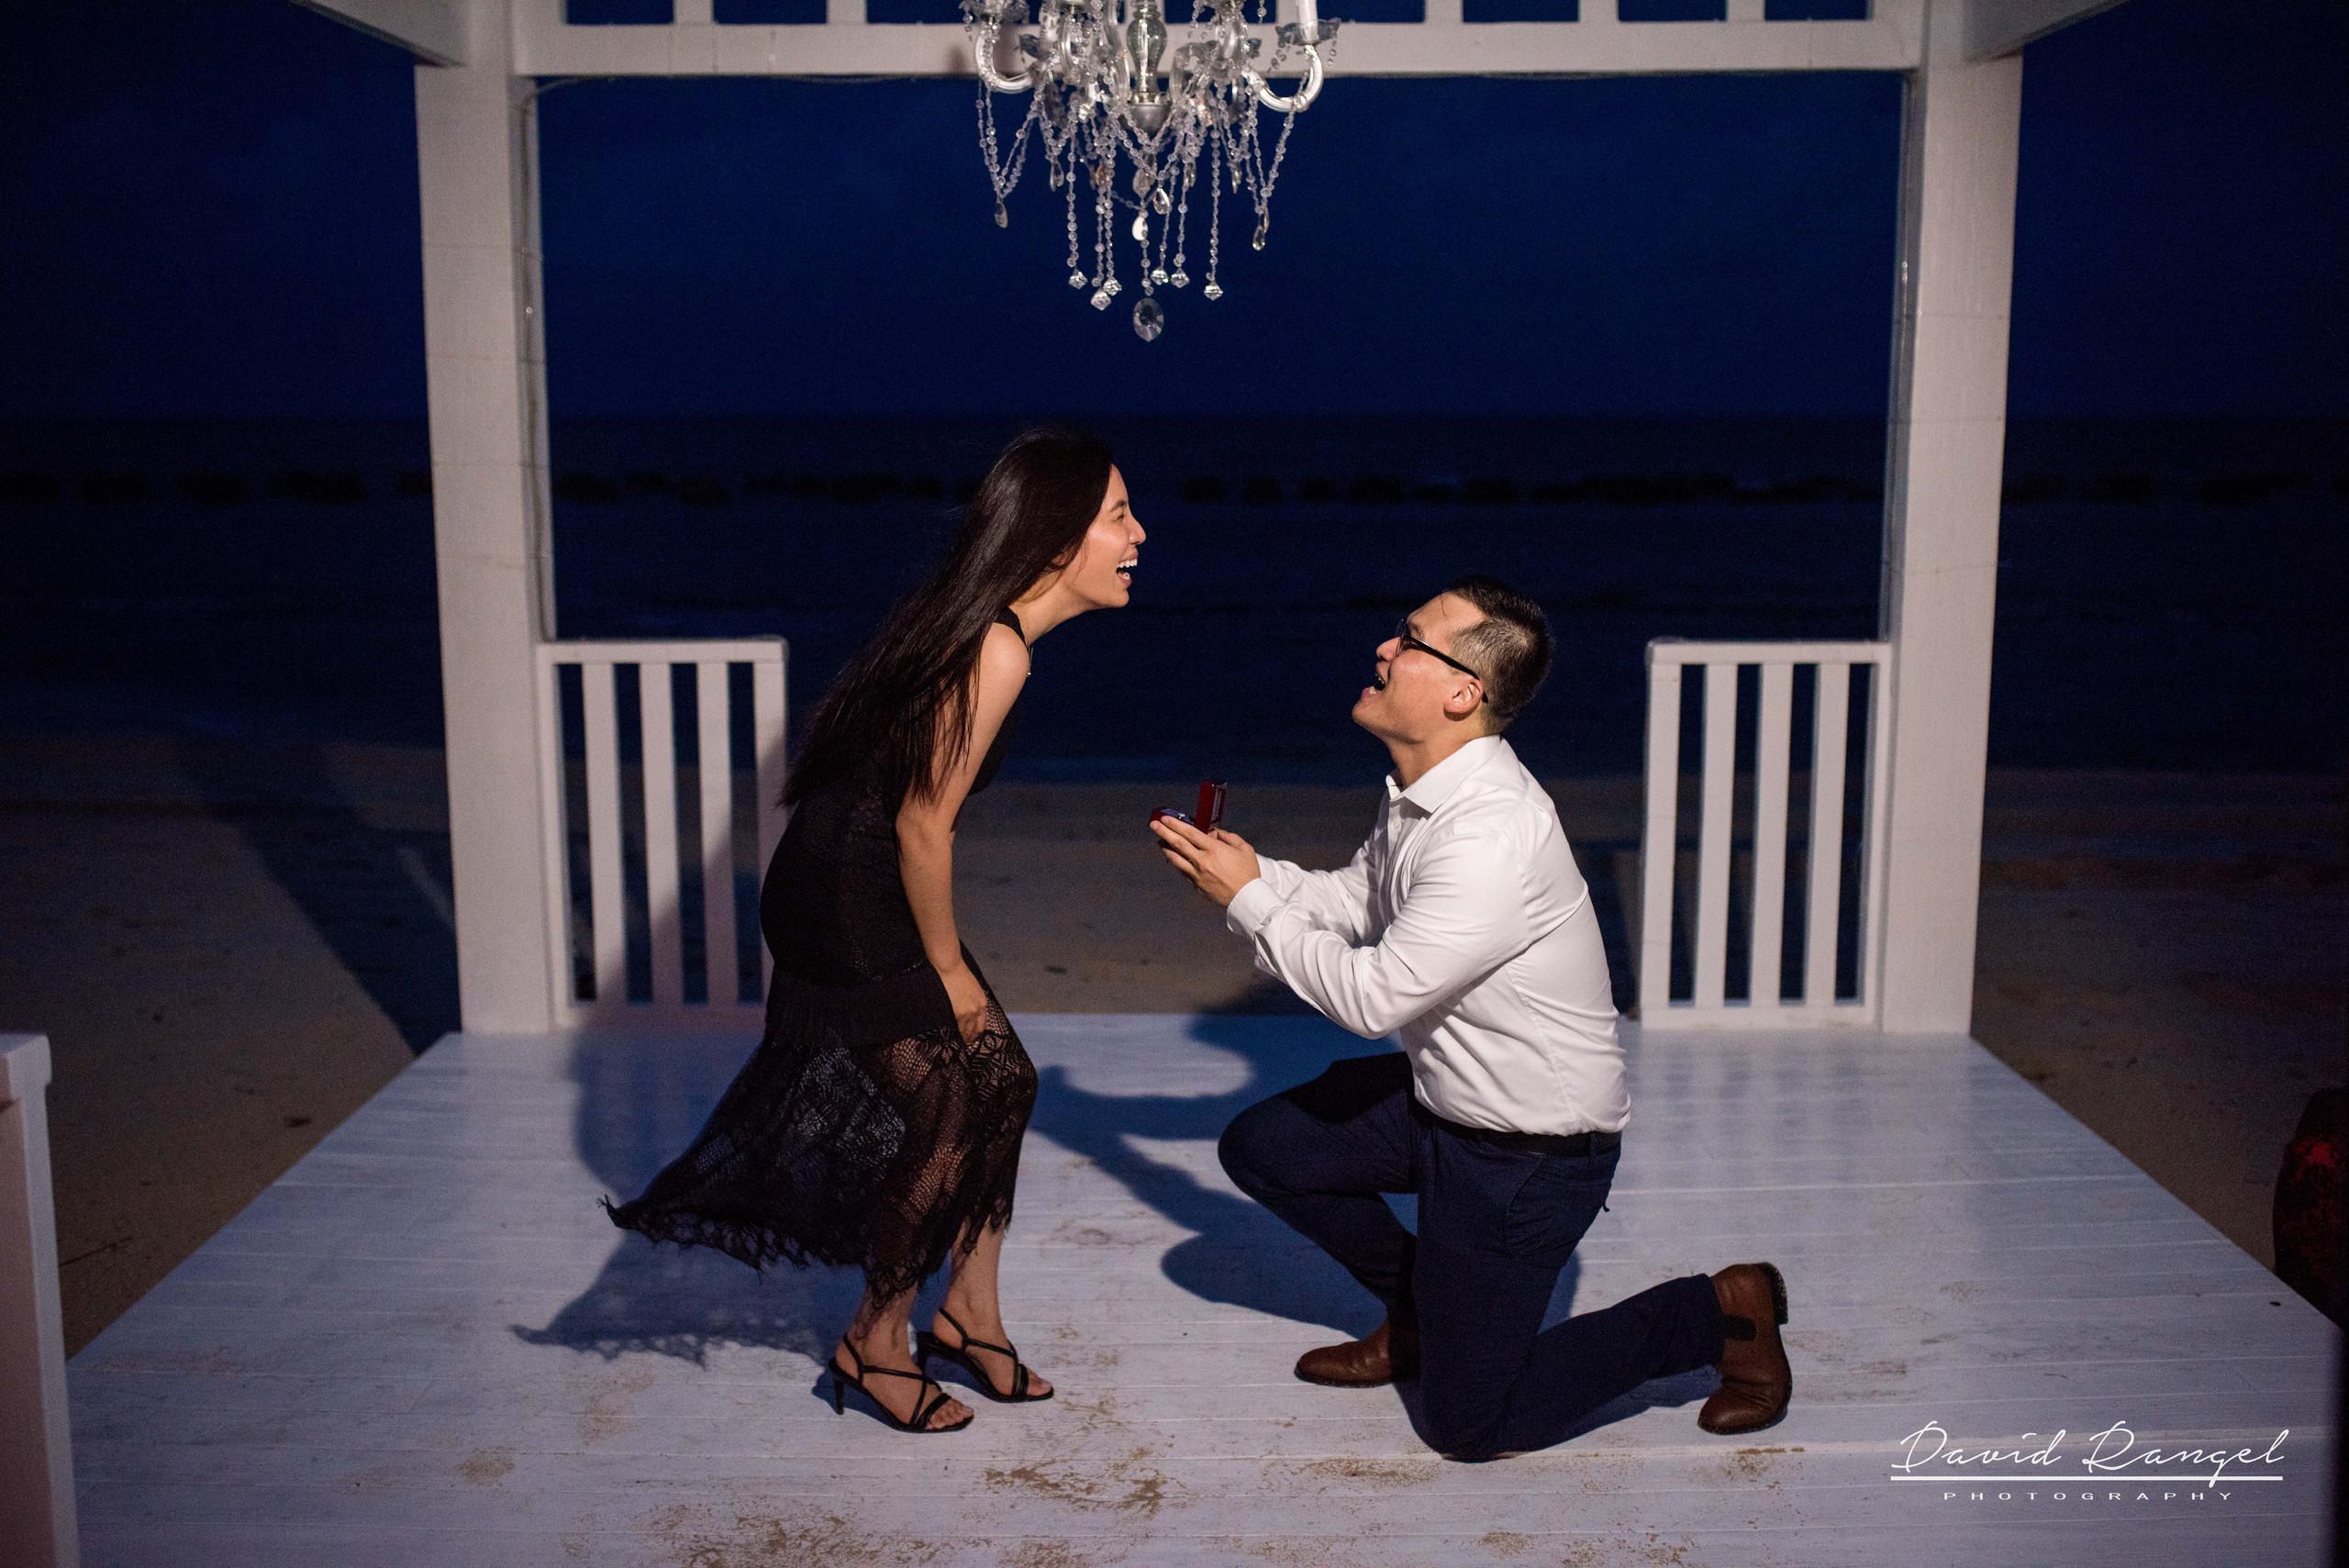 engagement+session+marriage+proposal+couple+night+photo+dorado+casitas+playa+del+carmen+photographer+destination+kiss+palm+trees